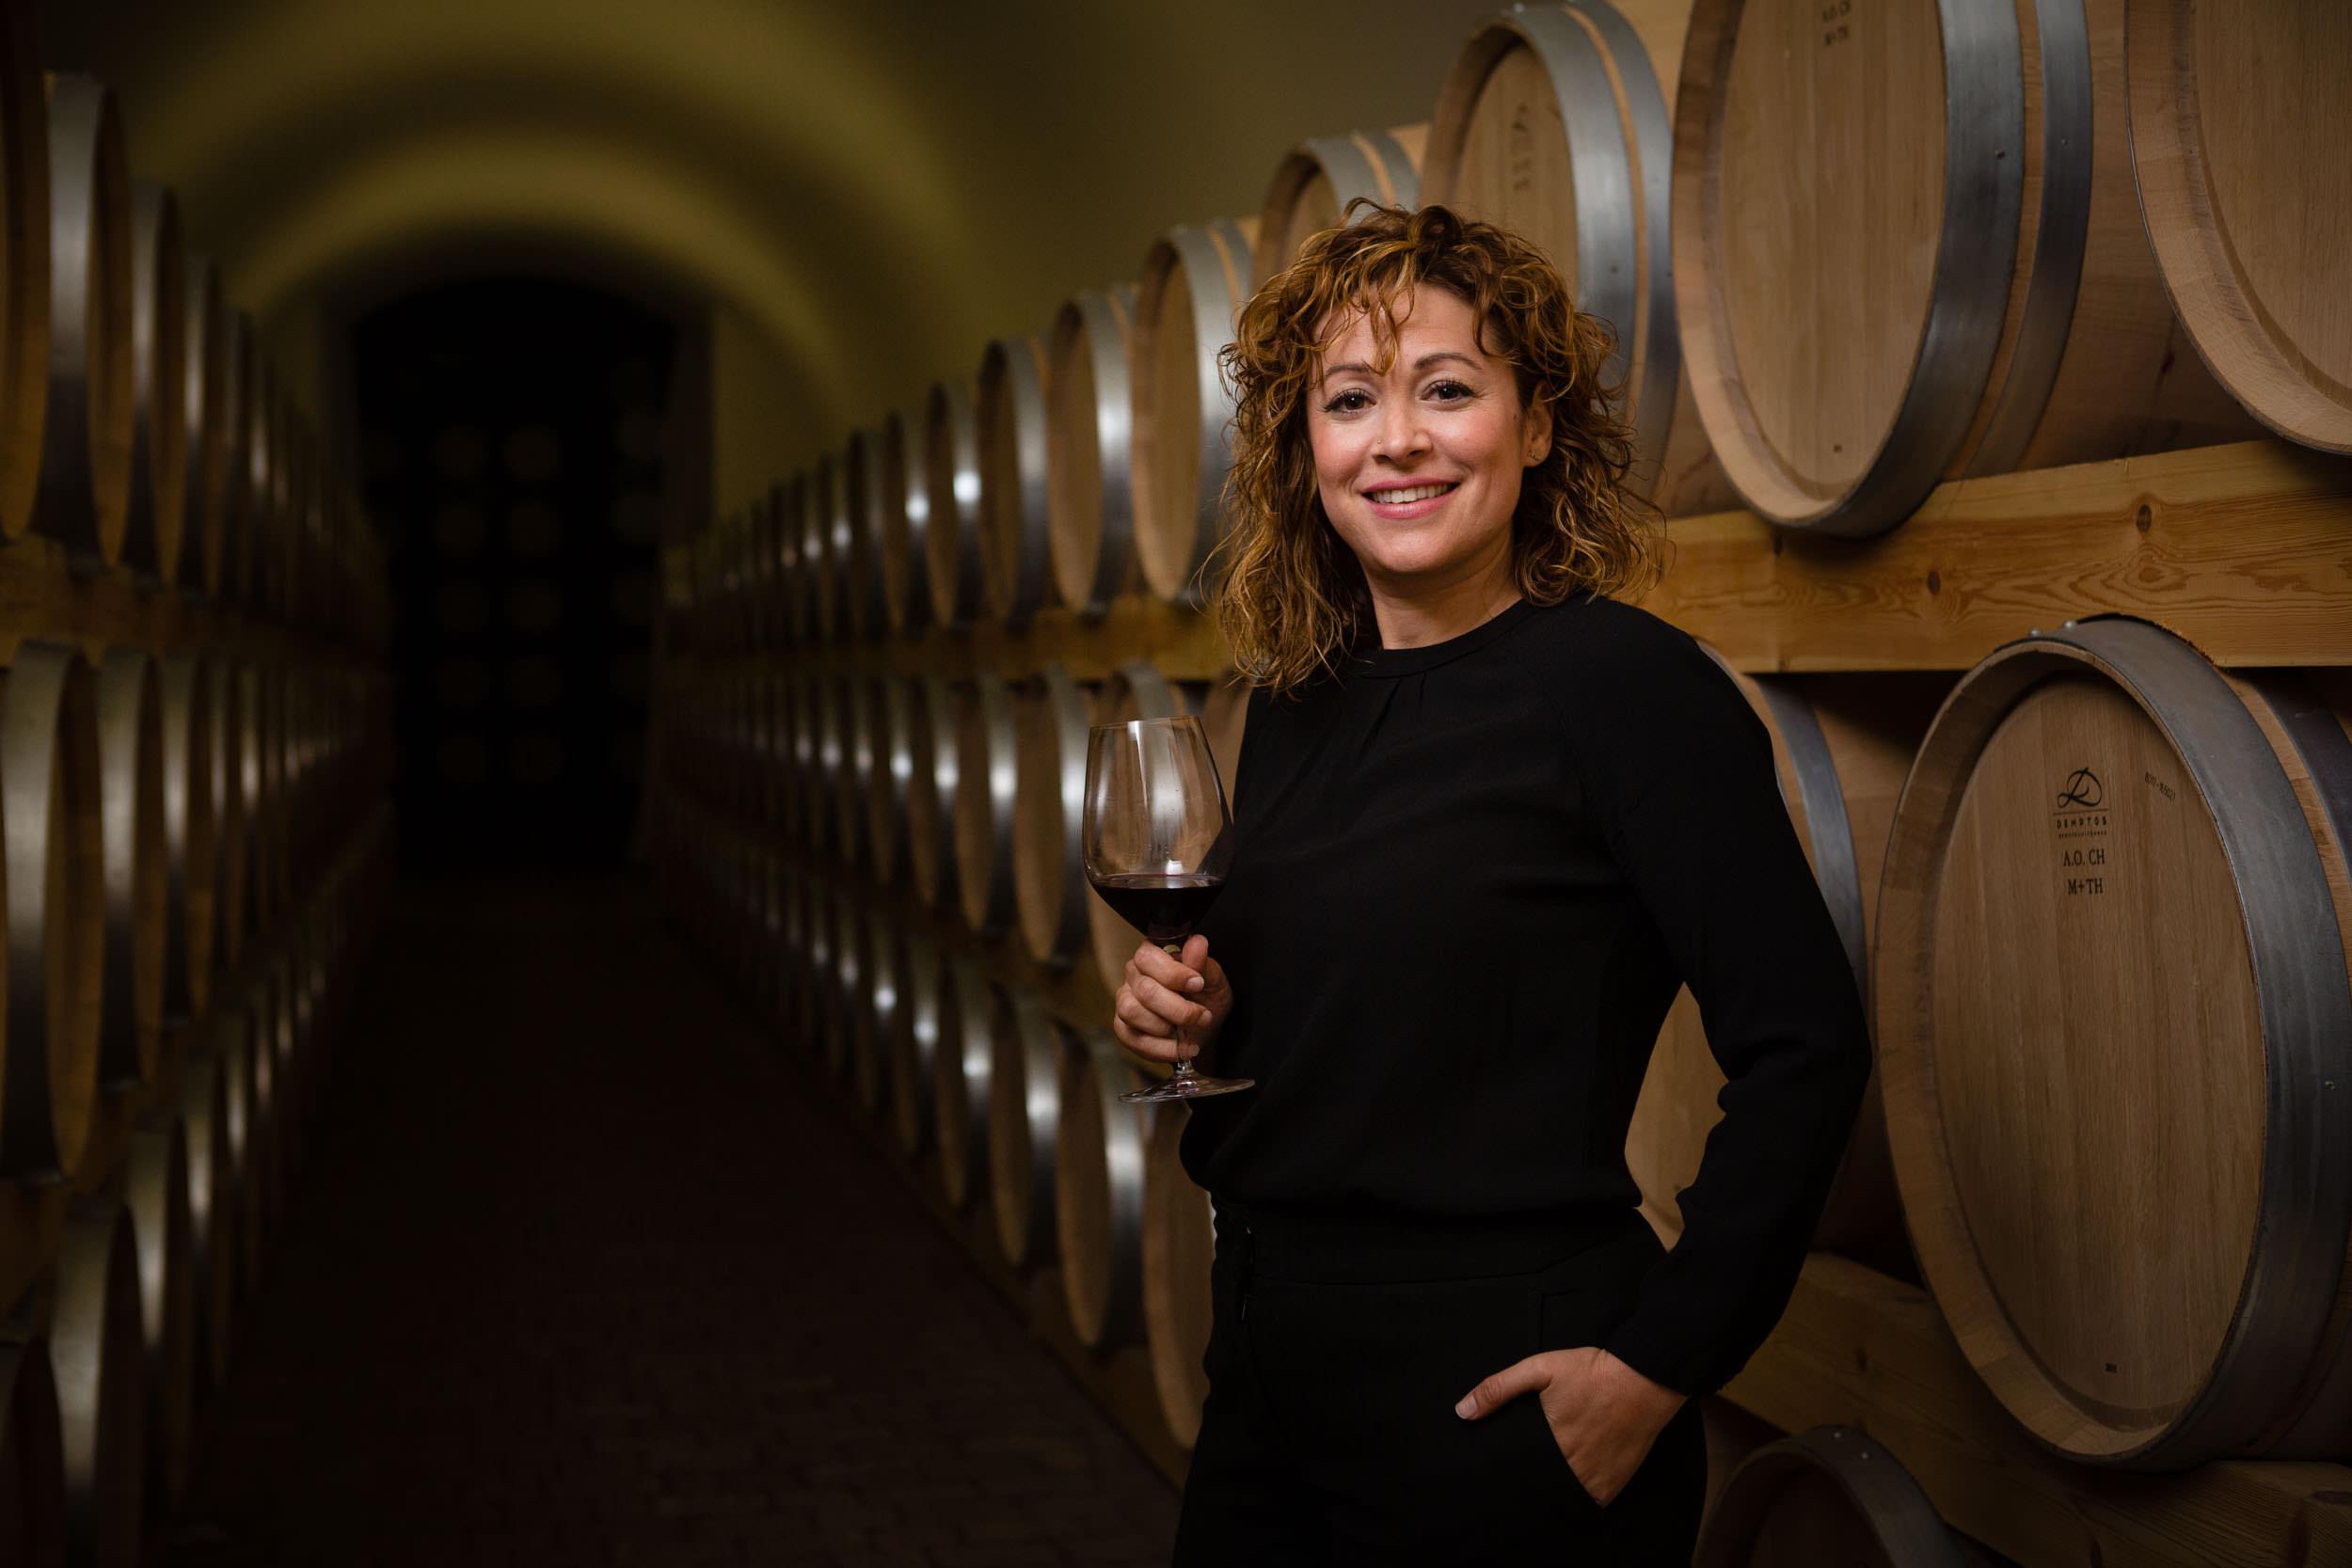 Mejor Fotografia Comercial y Editorial La Rioja y Pais Vasco Espana - James Sturcke - sturcke.org_001.jpg